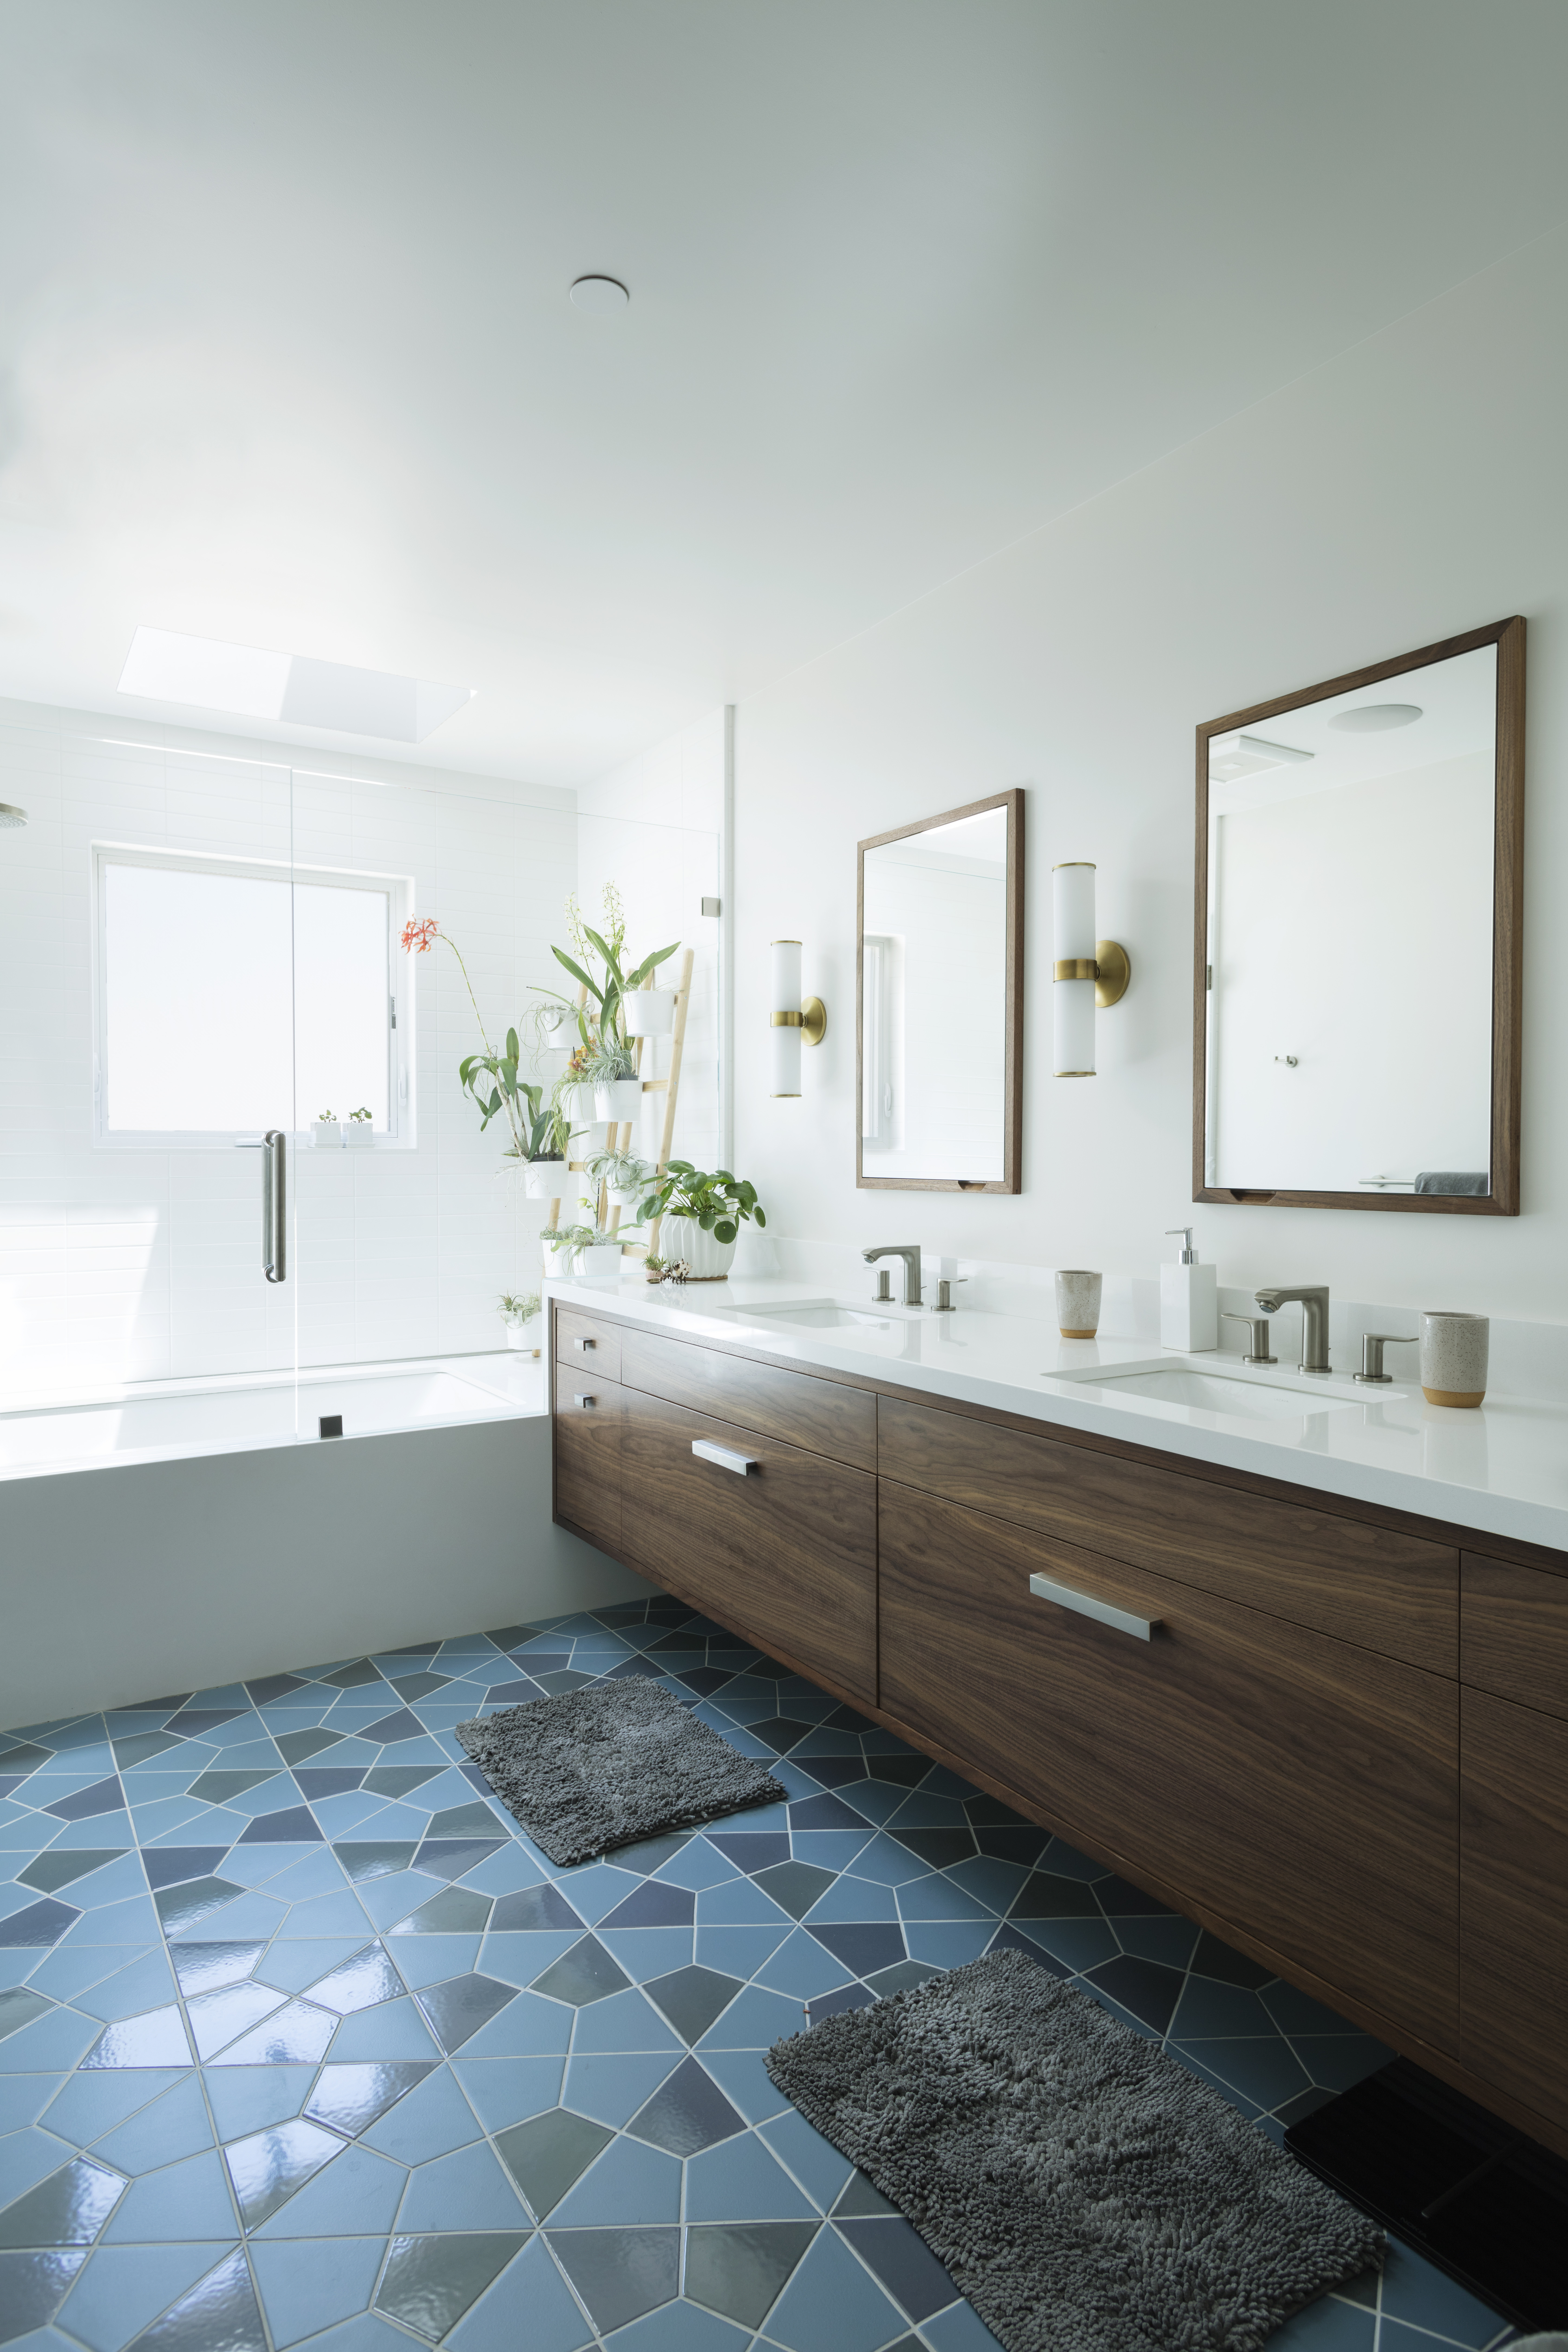 2017_Q4_Img_HI_RES_RIGHTS_young_america_creative_designer_commons_and_burt_contractor_ram_tile_sub_Lydia_lyons_interior_design_roger_casas_photographer_ceramic_blend_bathroom_floor_slate_blue_nautical_dusty_blue_3.jpg?mtime=20190220123025#asset:437940